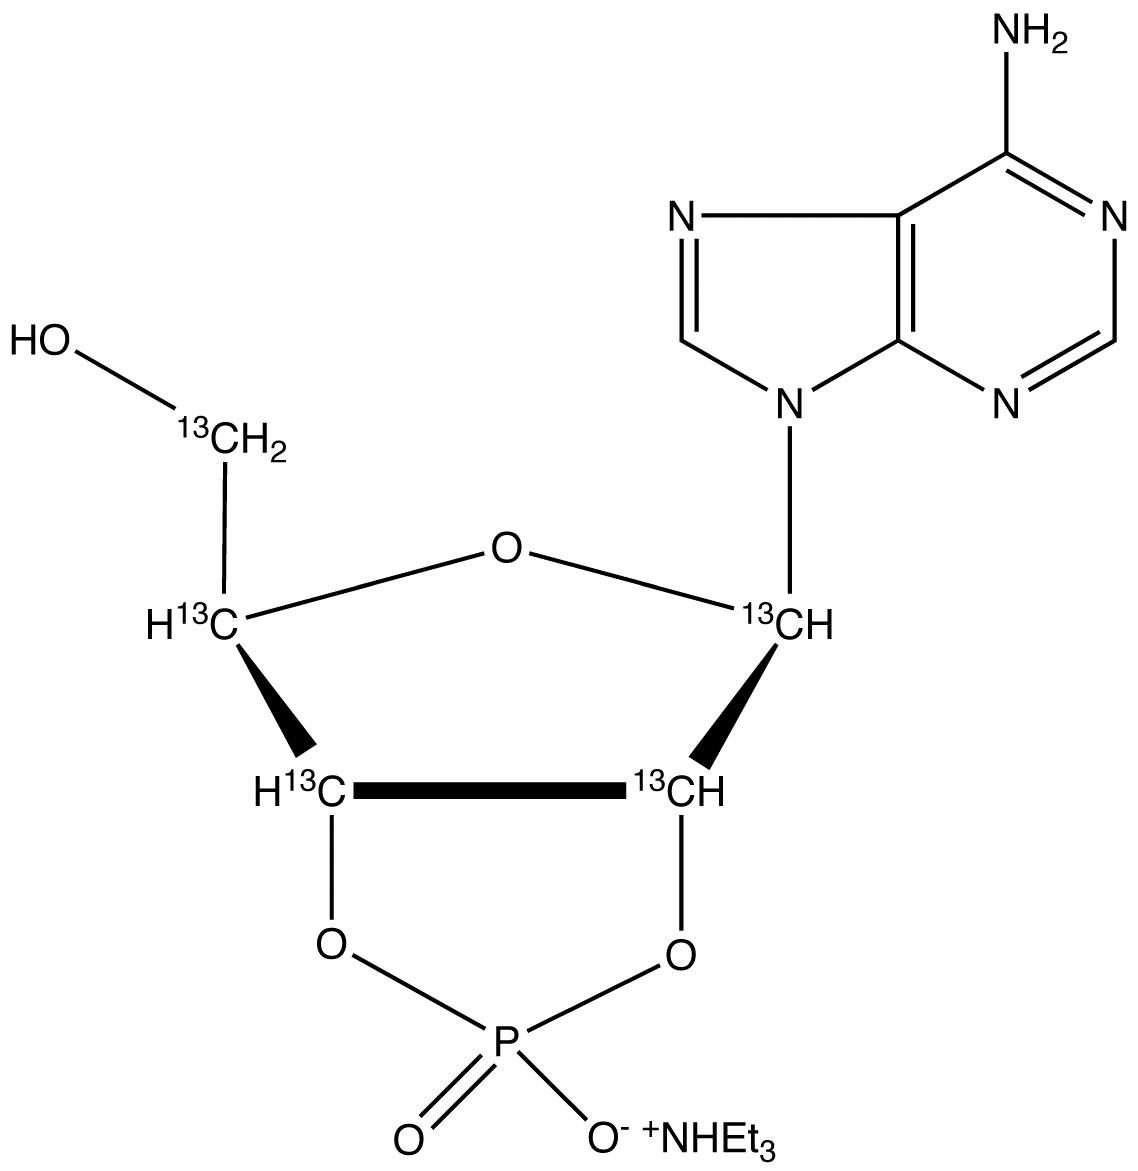 Adenosine 2&#146;,3&#146;-Cyclic Phosphate-<sup>13</sup>C<sub>5</sub> Triethylammonium Salt